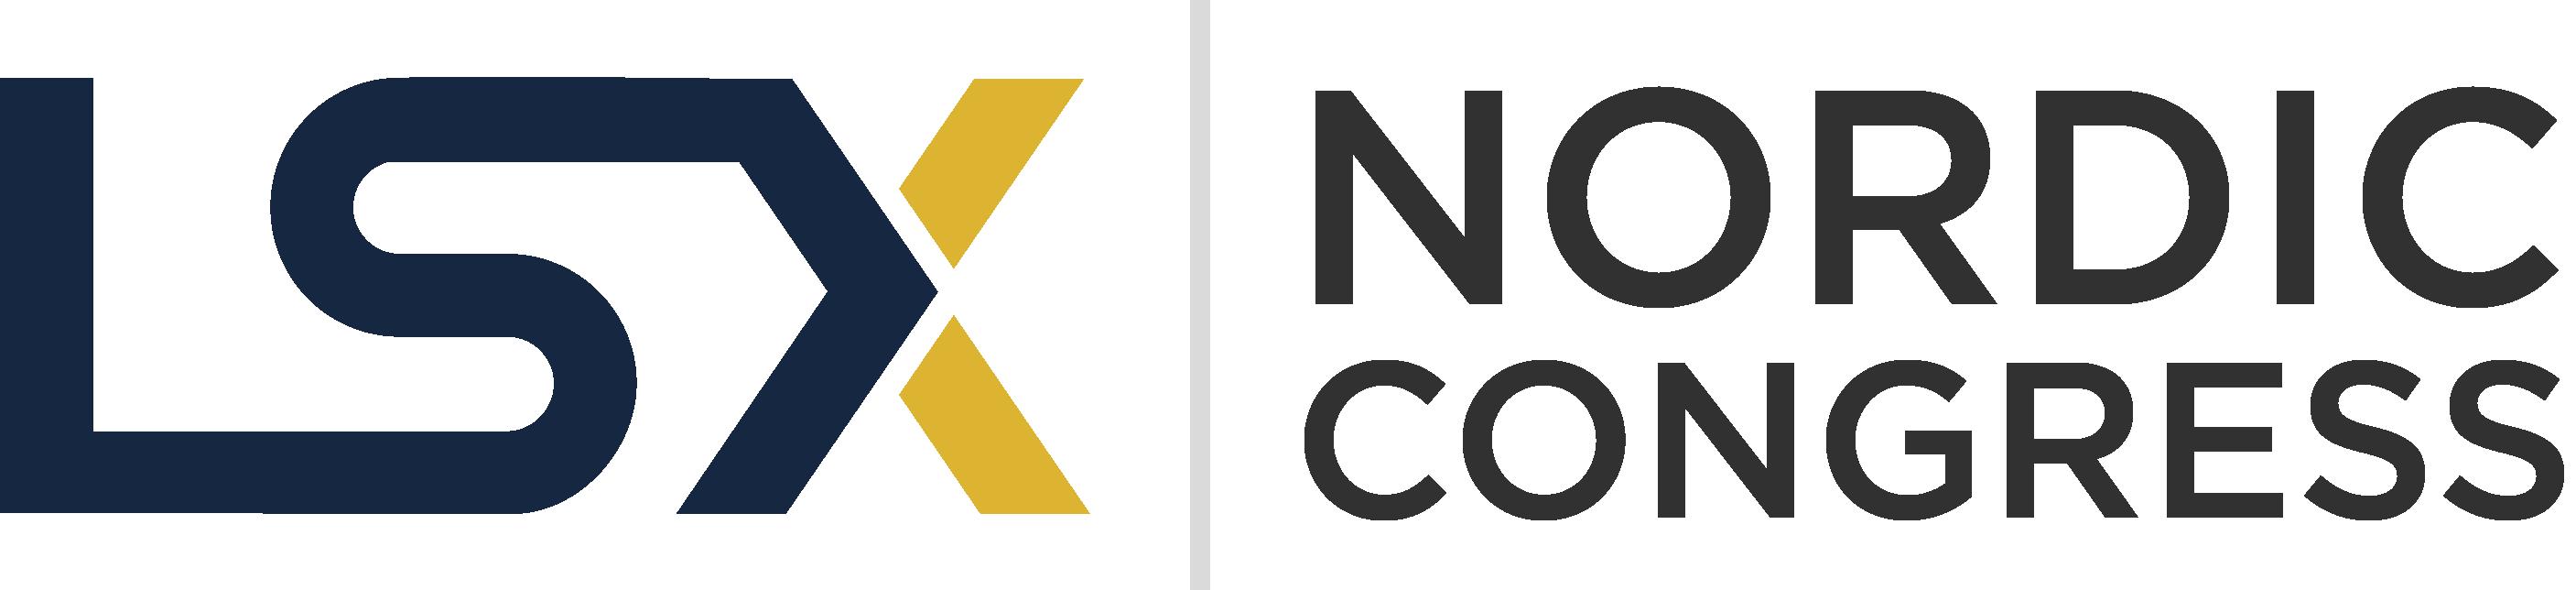 LSX Nordic Congress